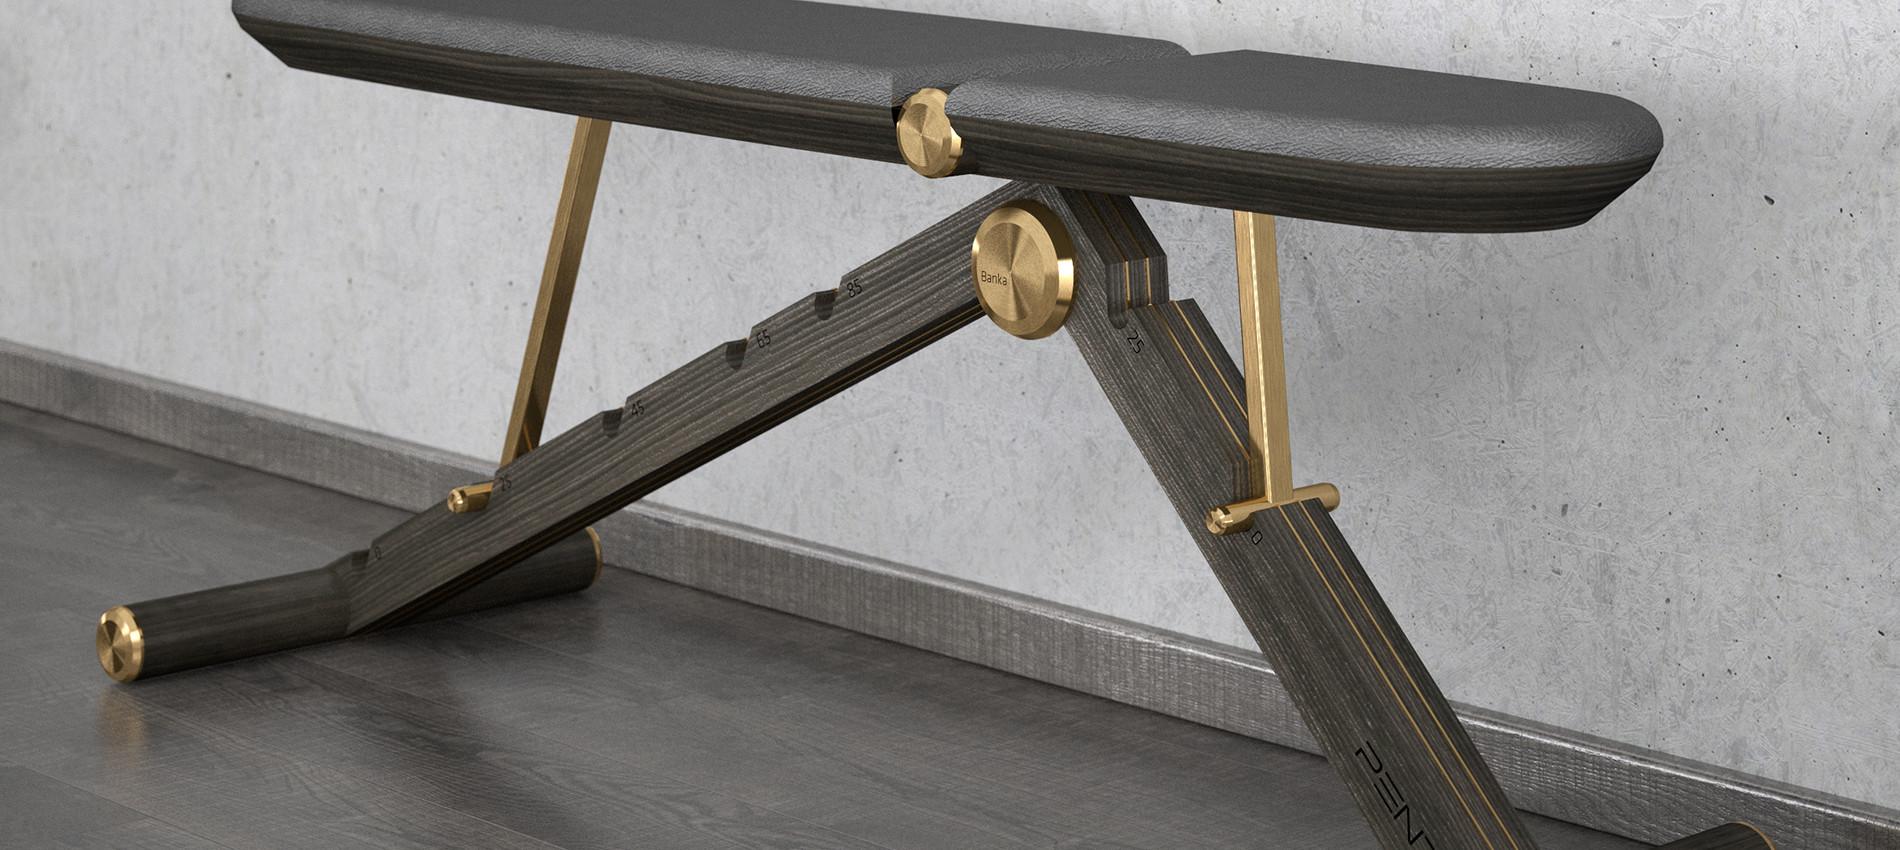 BANKA luxury weight bench with bronze.jp